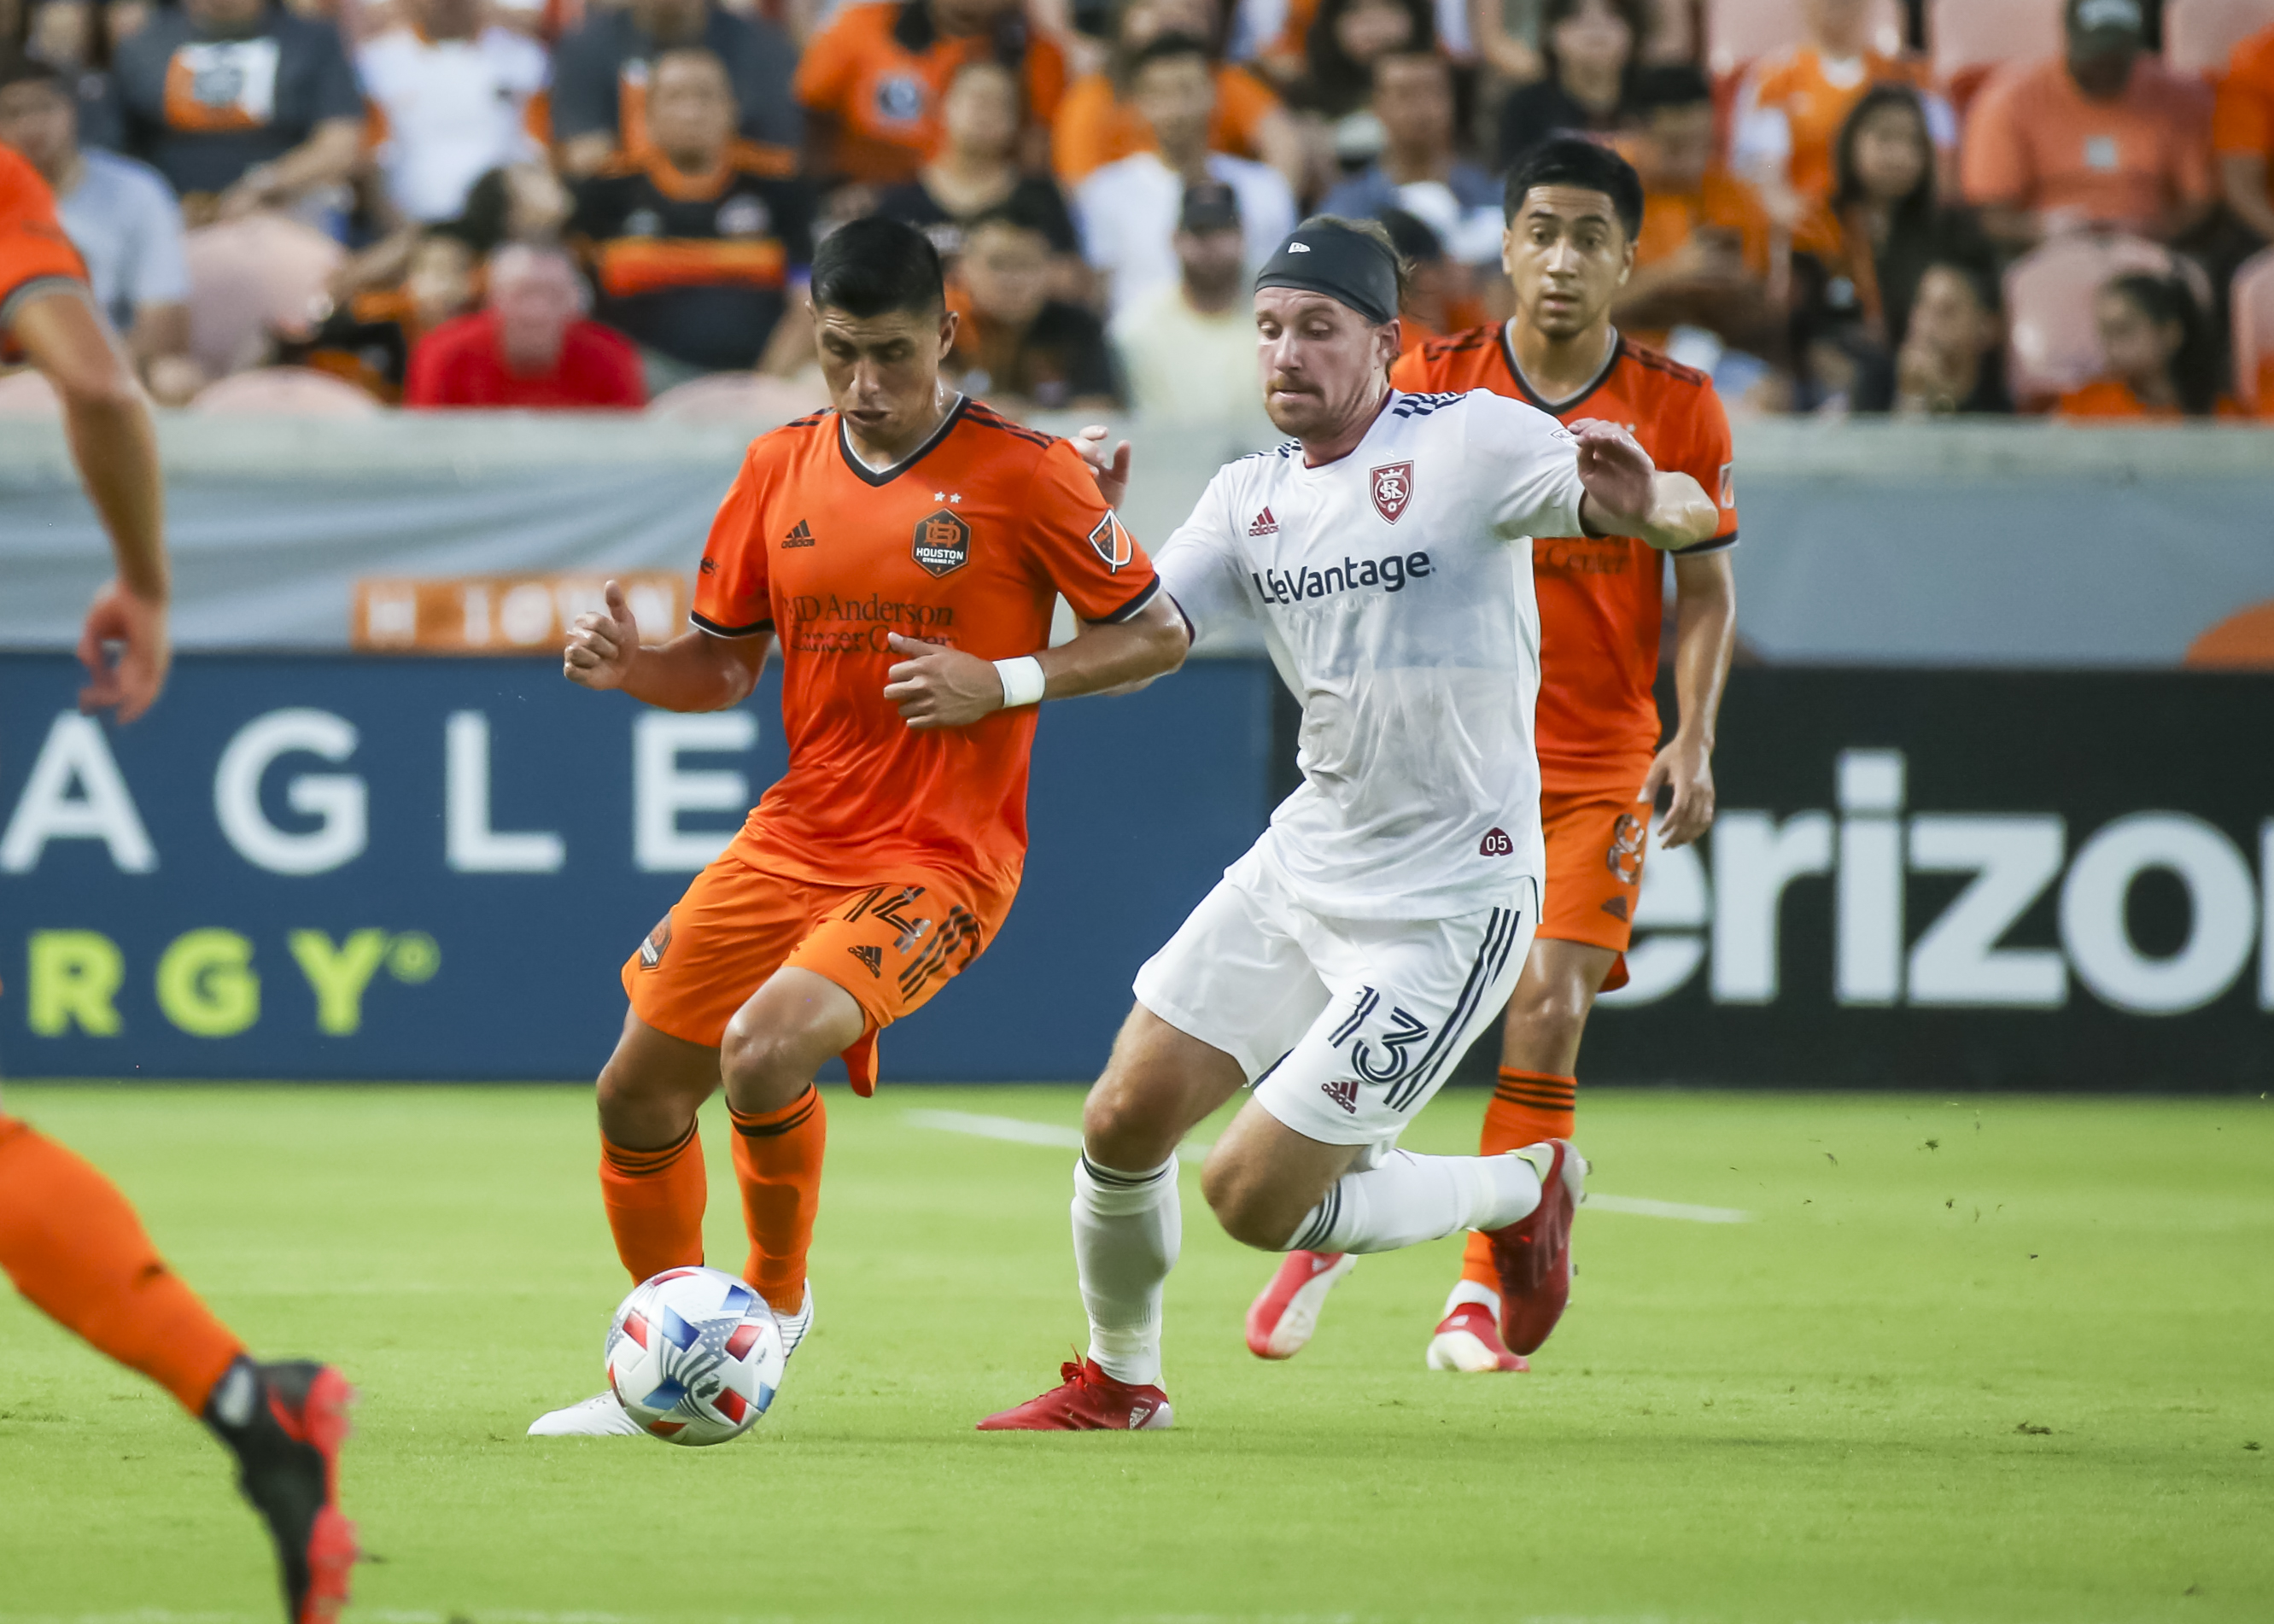 SOCCER: JUL 31 MLS - Real Salt Lake at Houston Dynamo FC